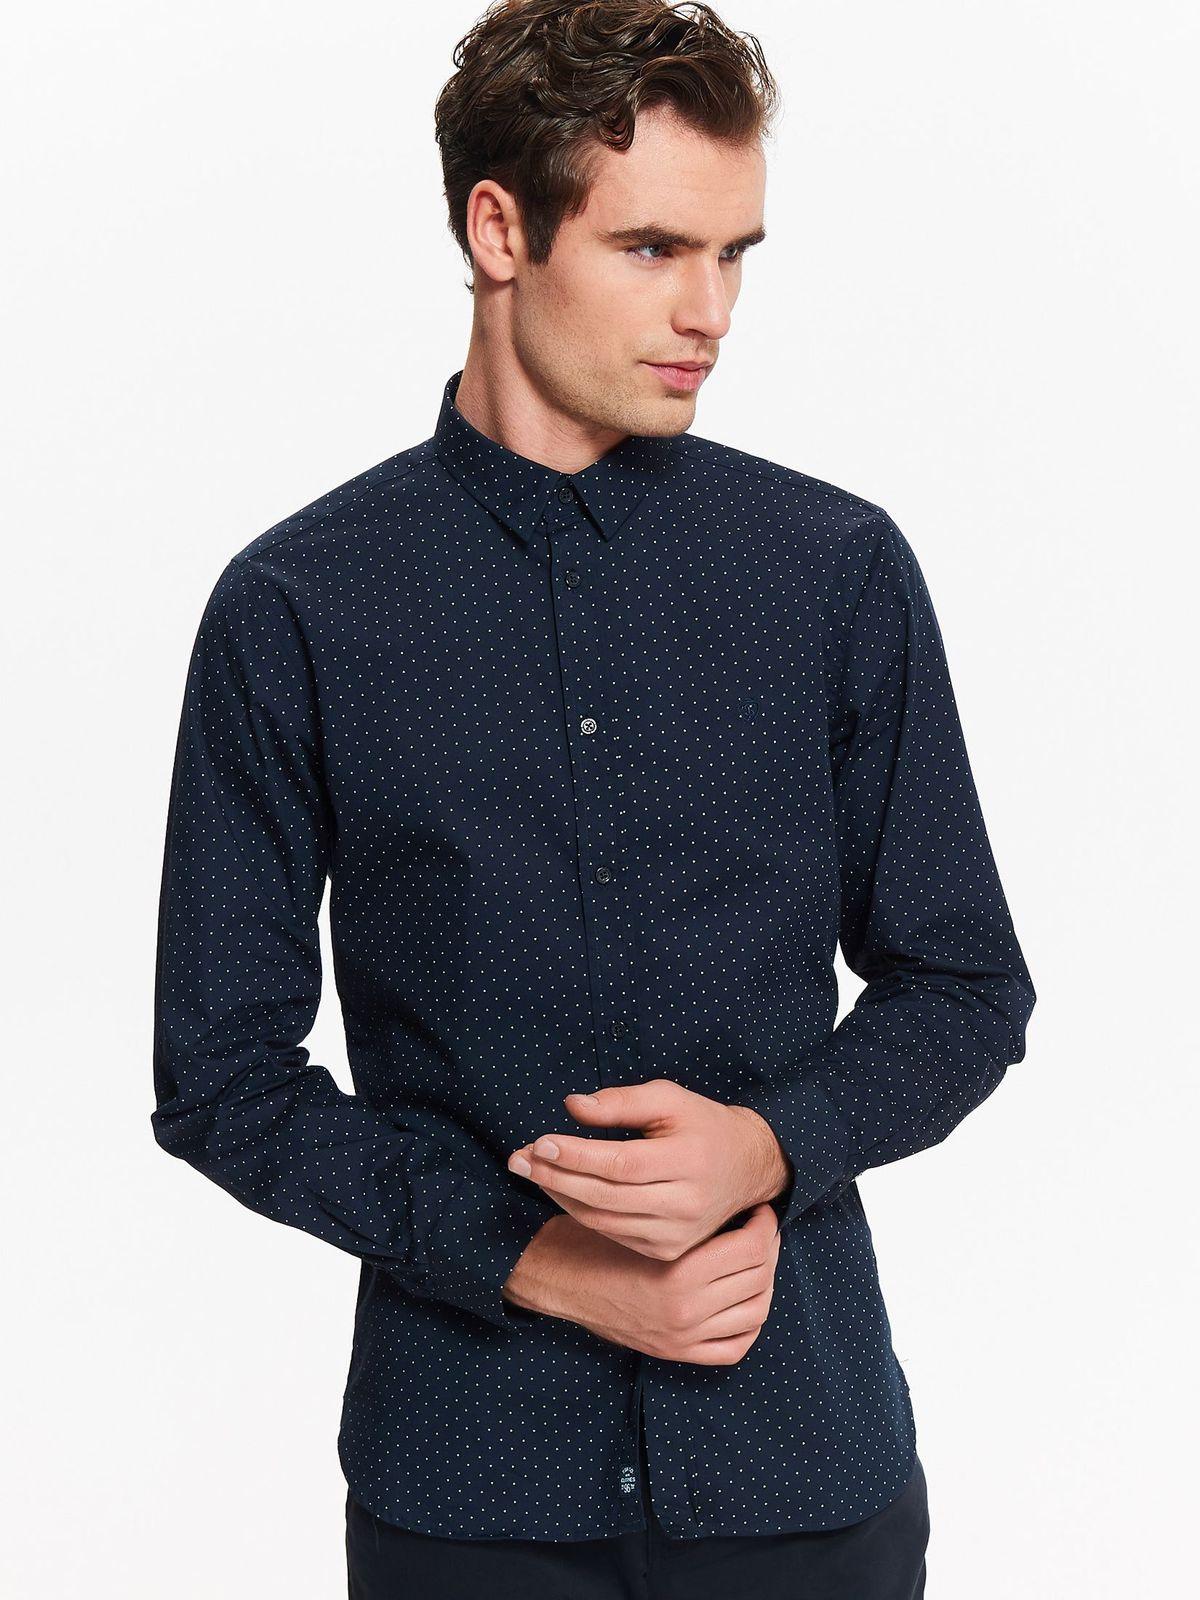 TOP SECRET top secret slim fit πουα πουκαμισο